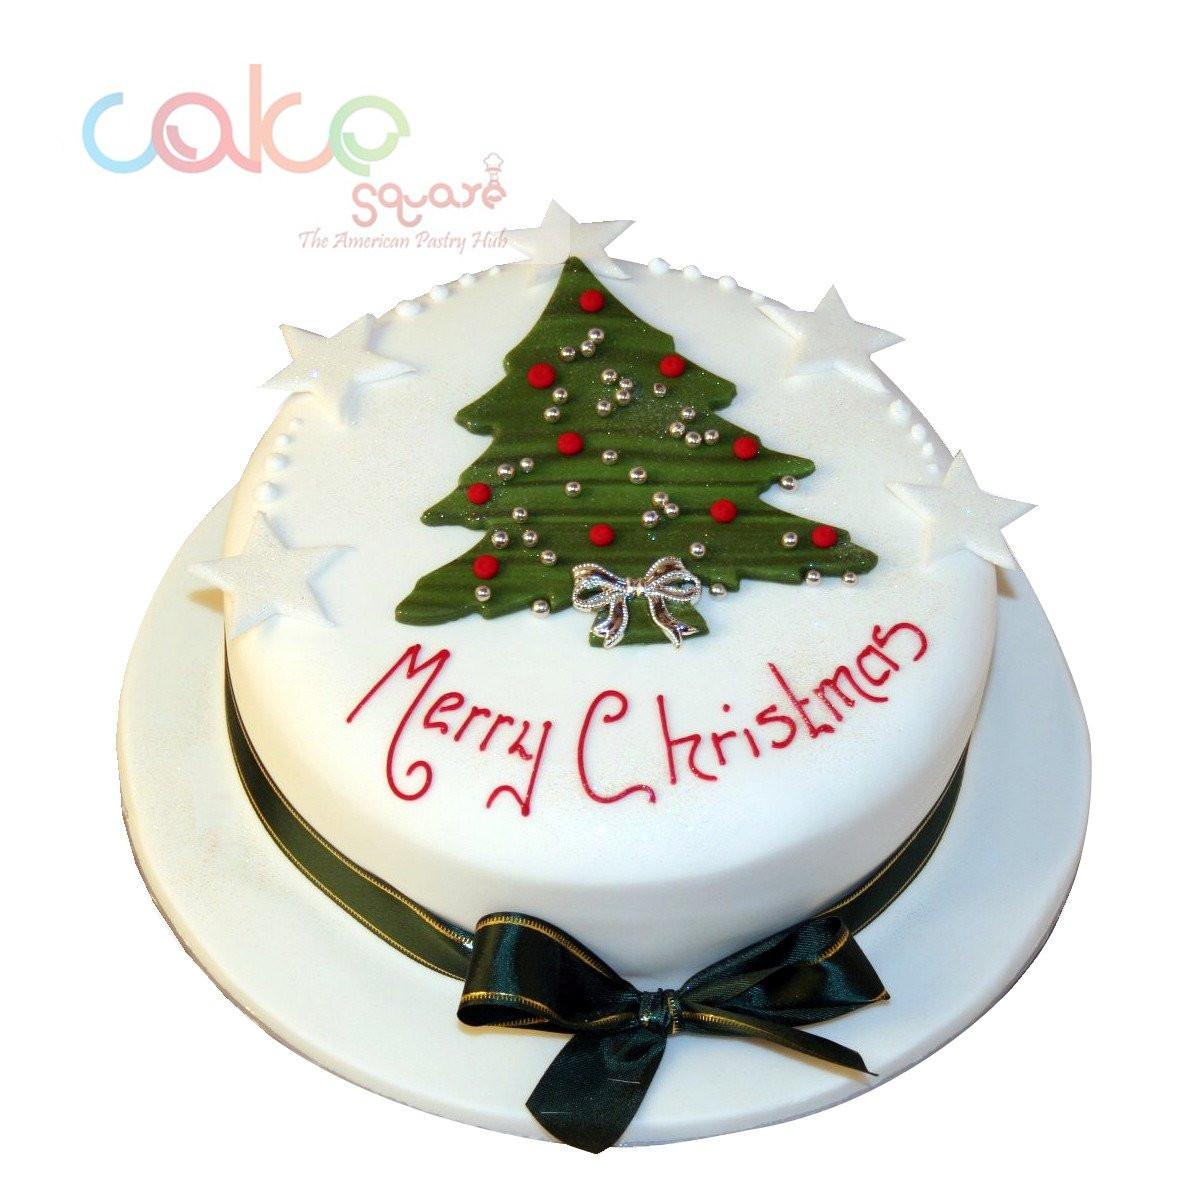 Merry Christmas Cakes  1 Merry Christmas Cake Decoration